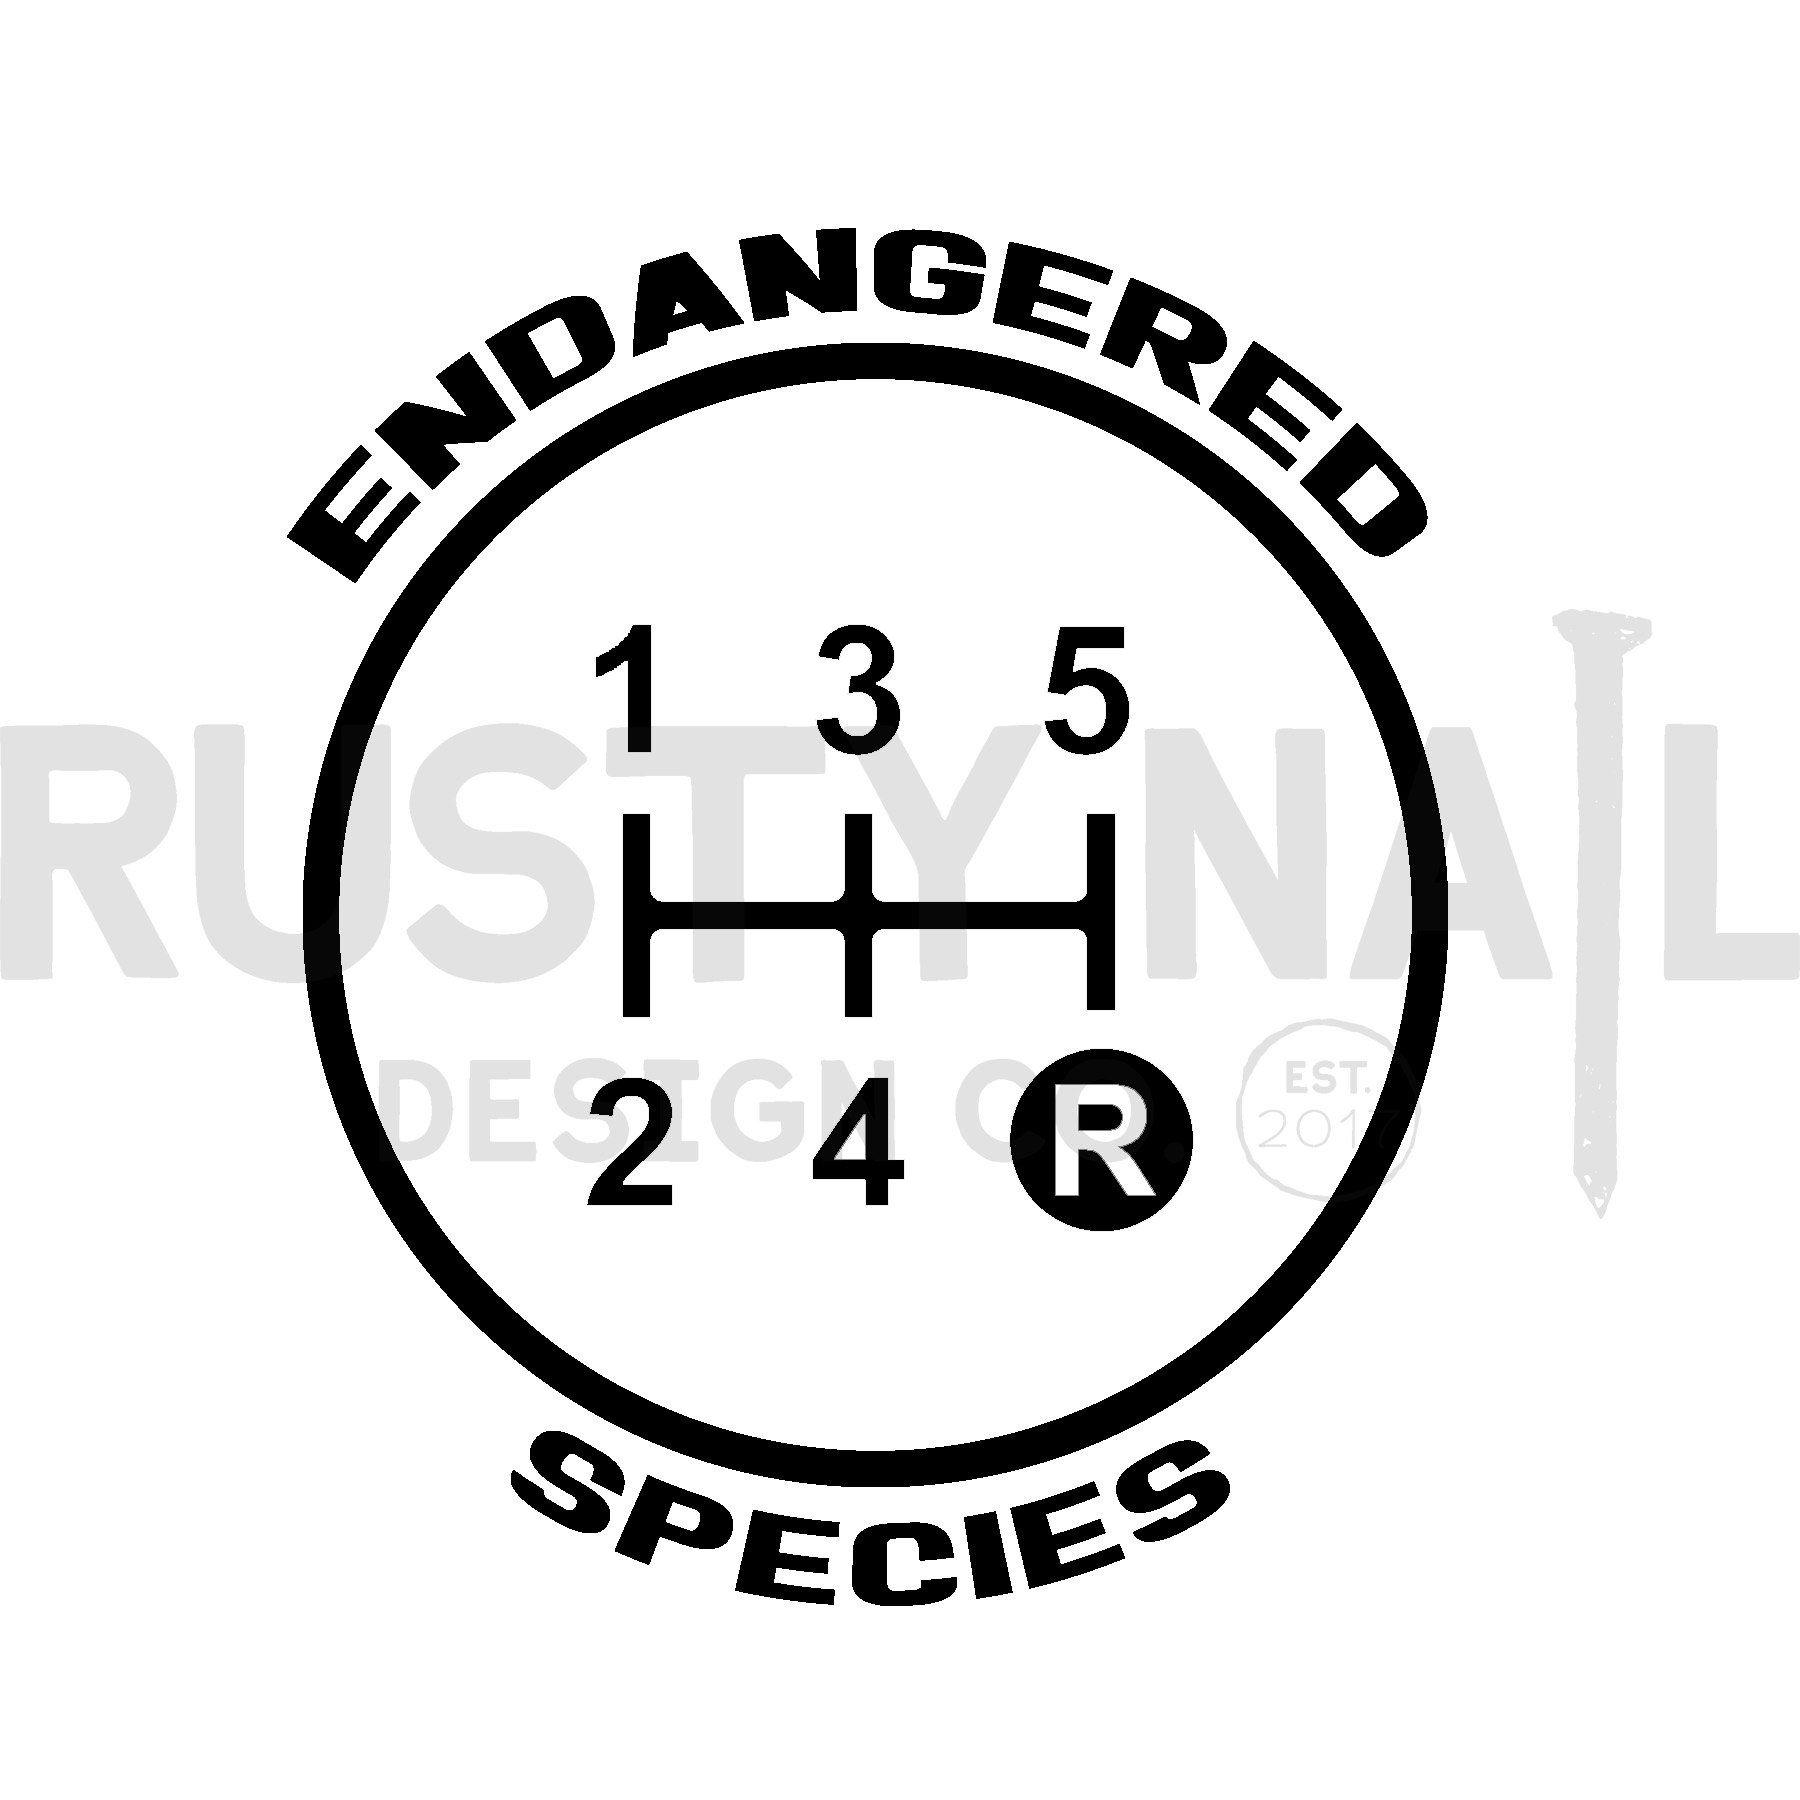 Detroit car Drive Manual Gear Round Stick Shift Endangered Species Sticker